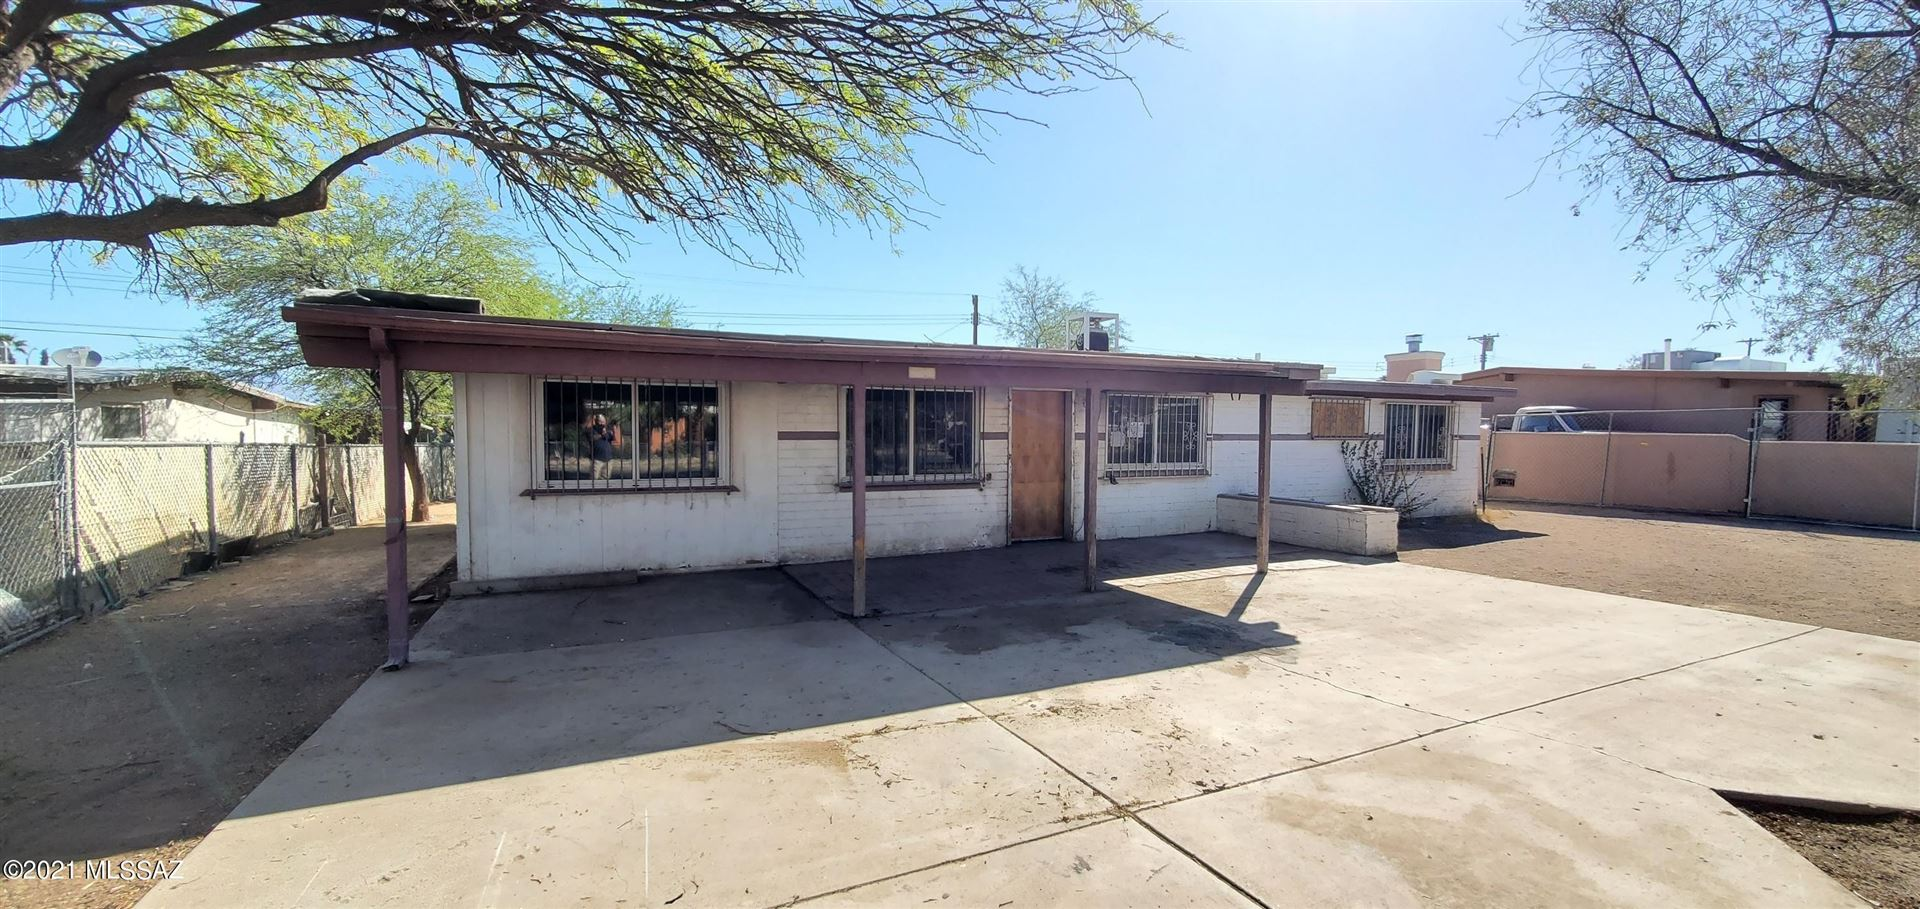 5409 S Alaska Drive, Tucson, AZ 85706 - MLS#: 22112161